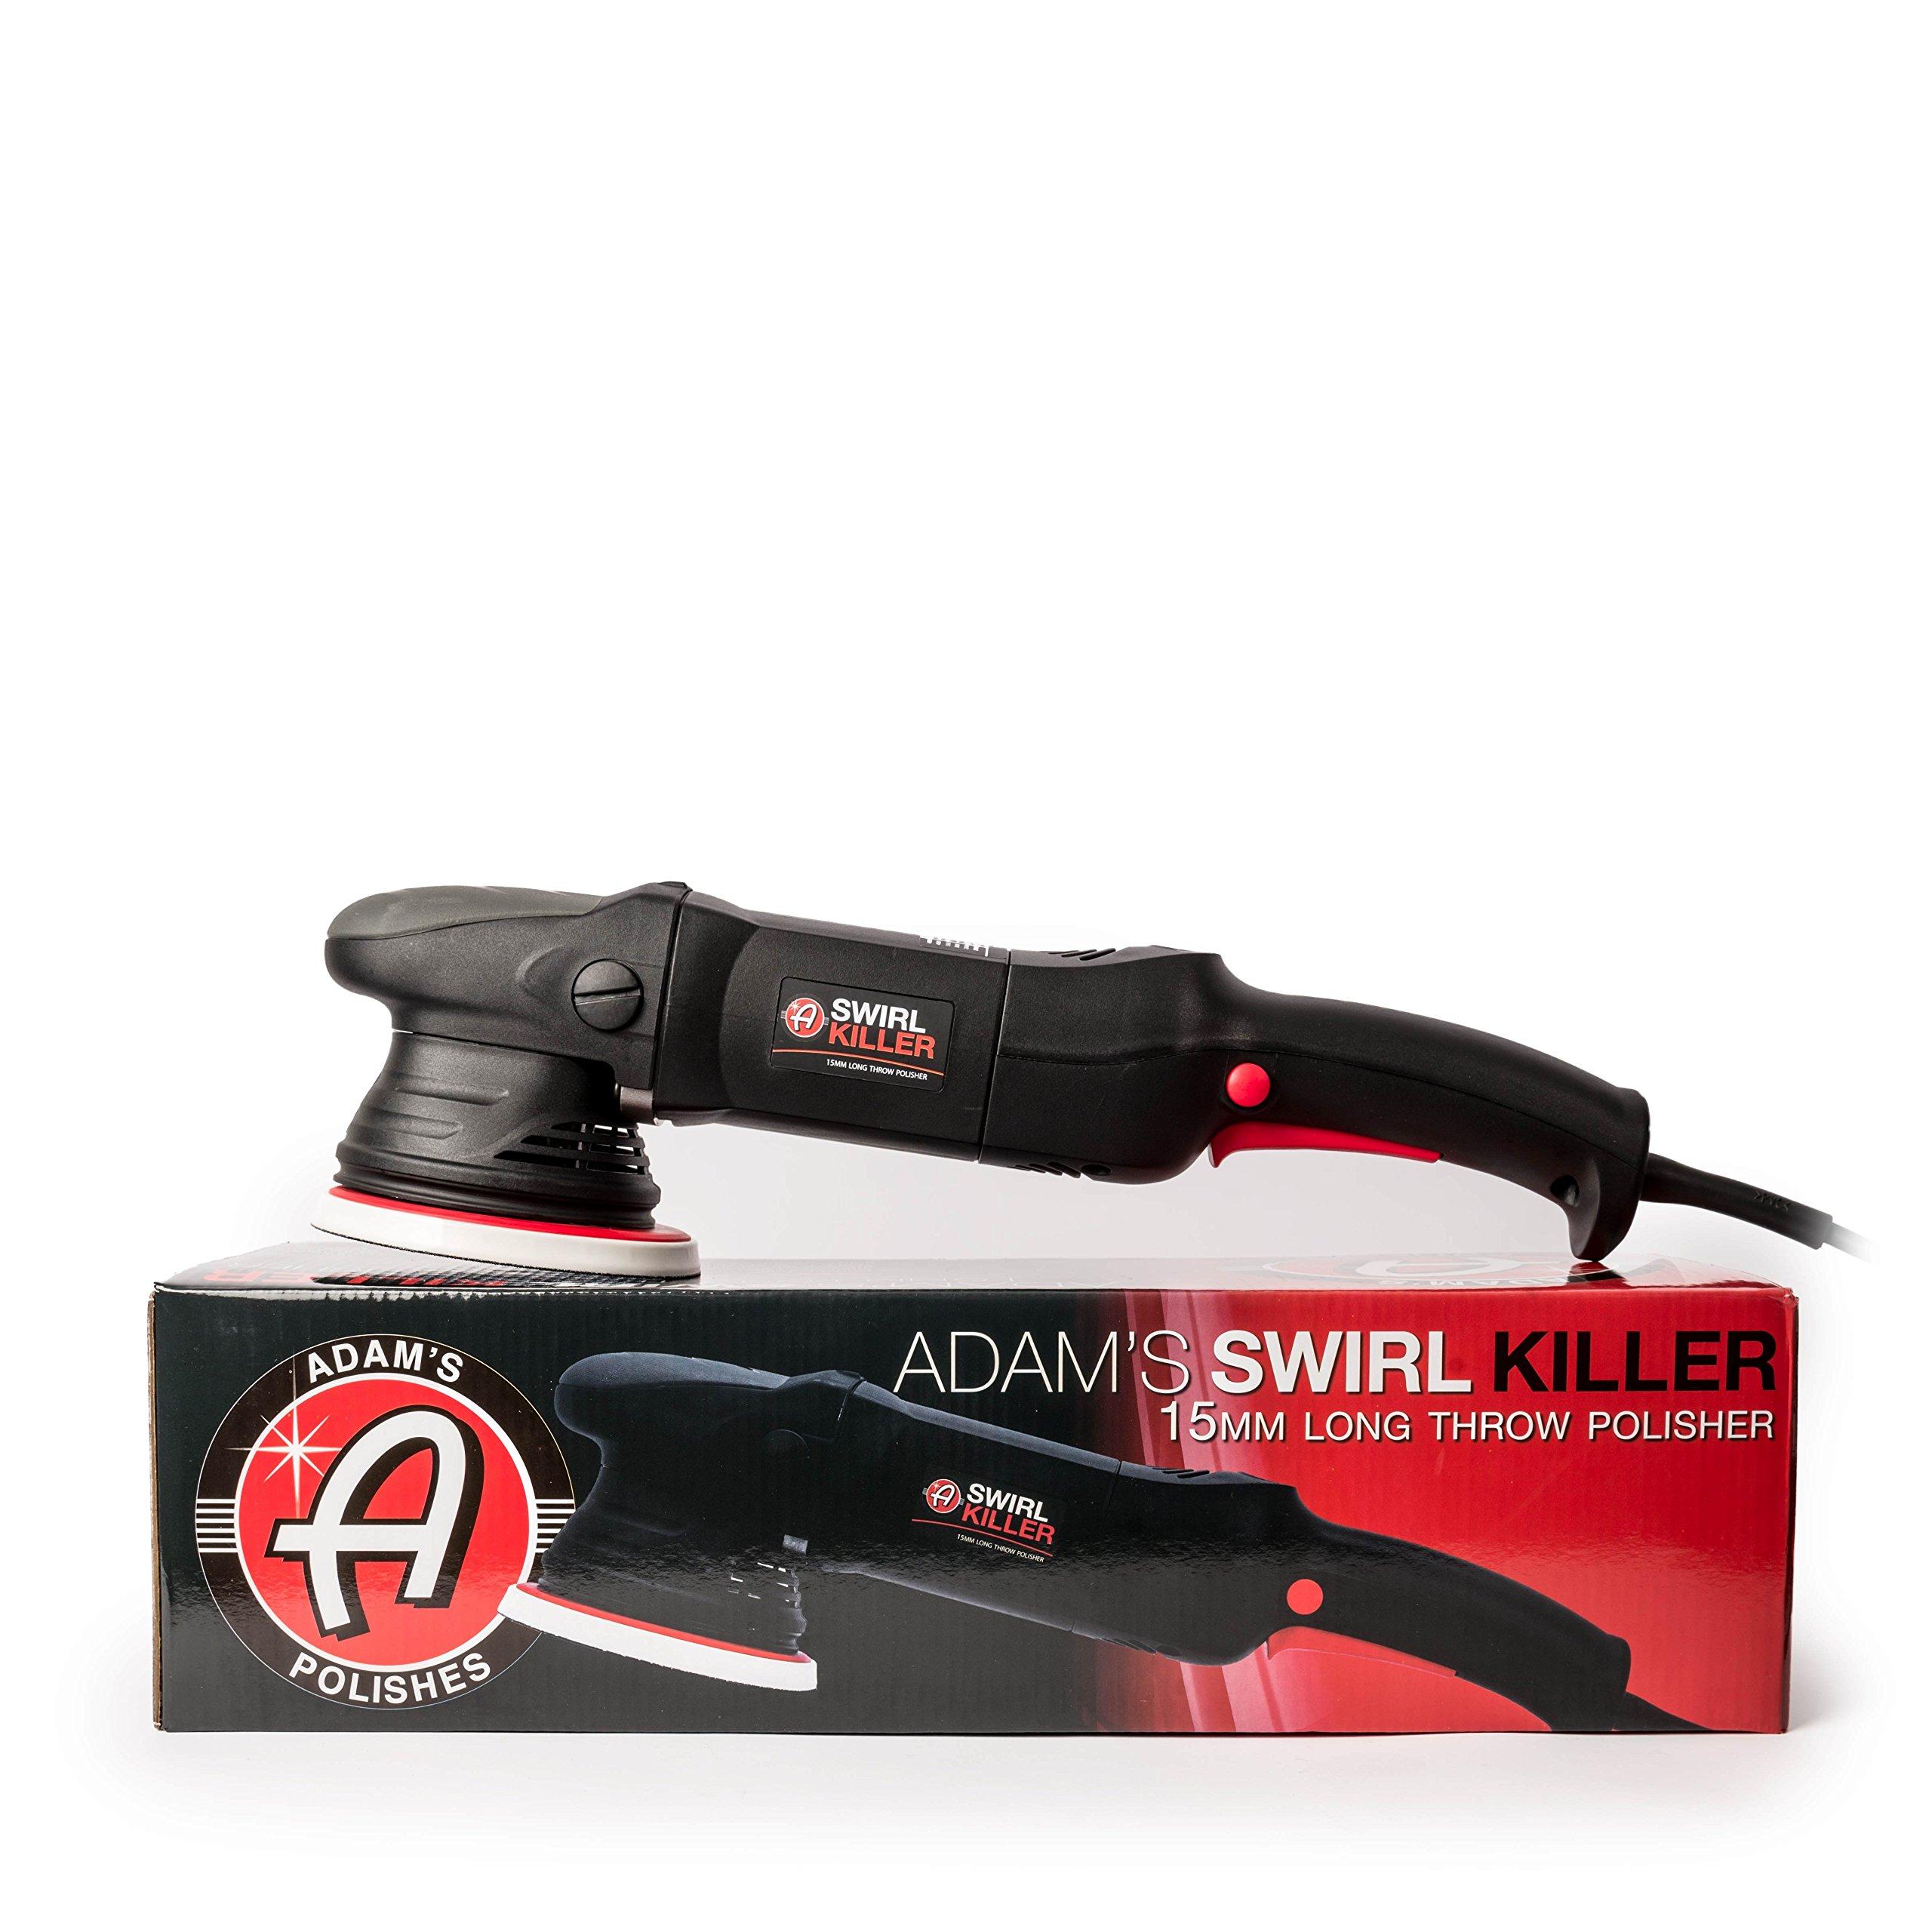 Adam's Swirl Killer 15mm Long Throw Polisher (Polisher)